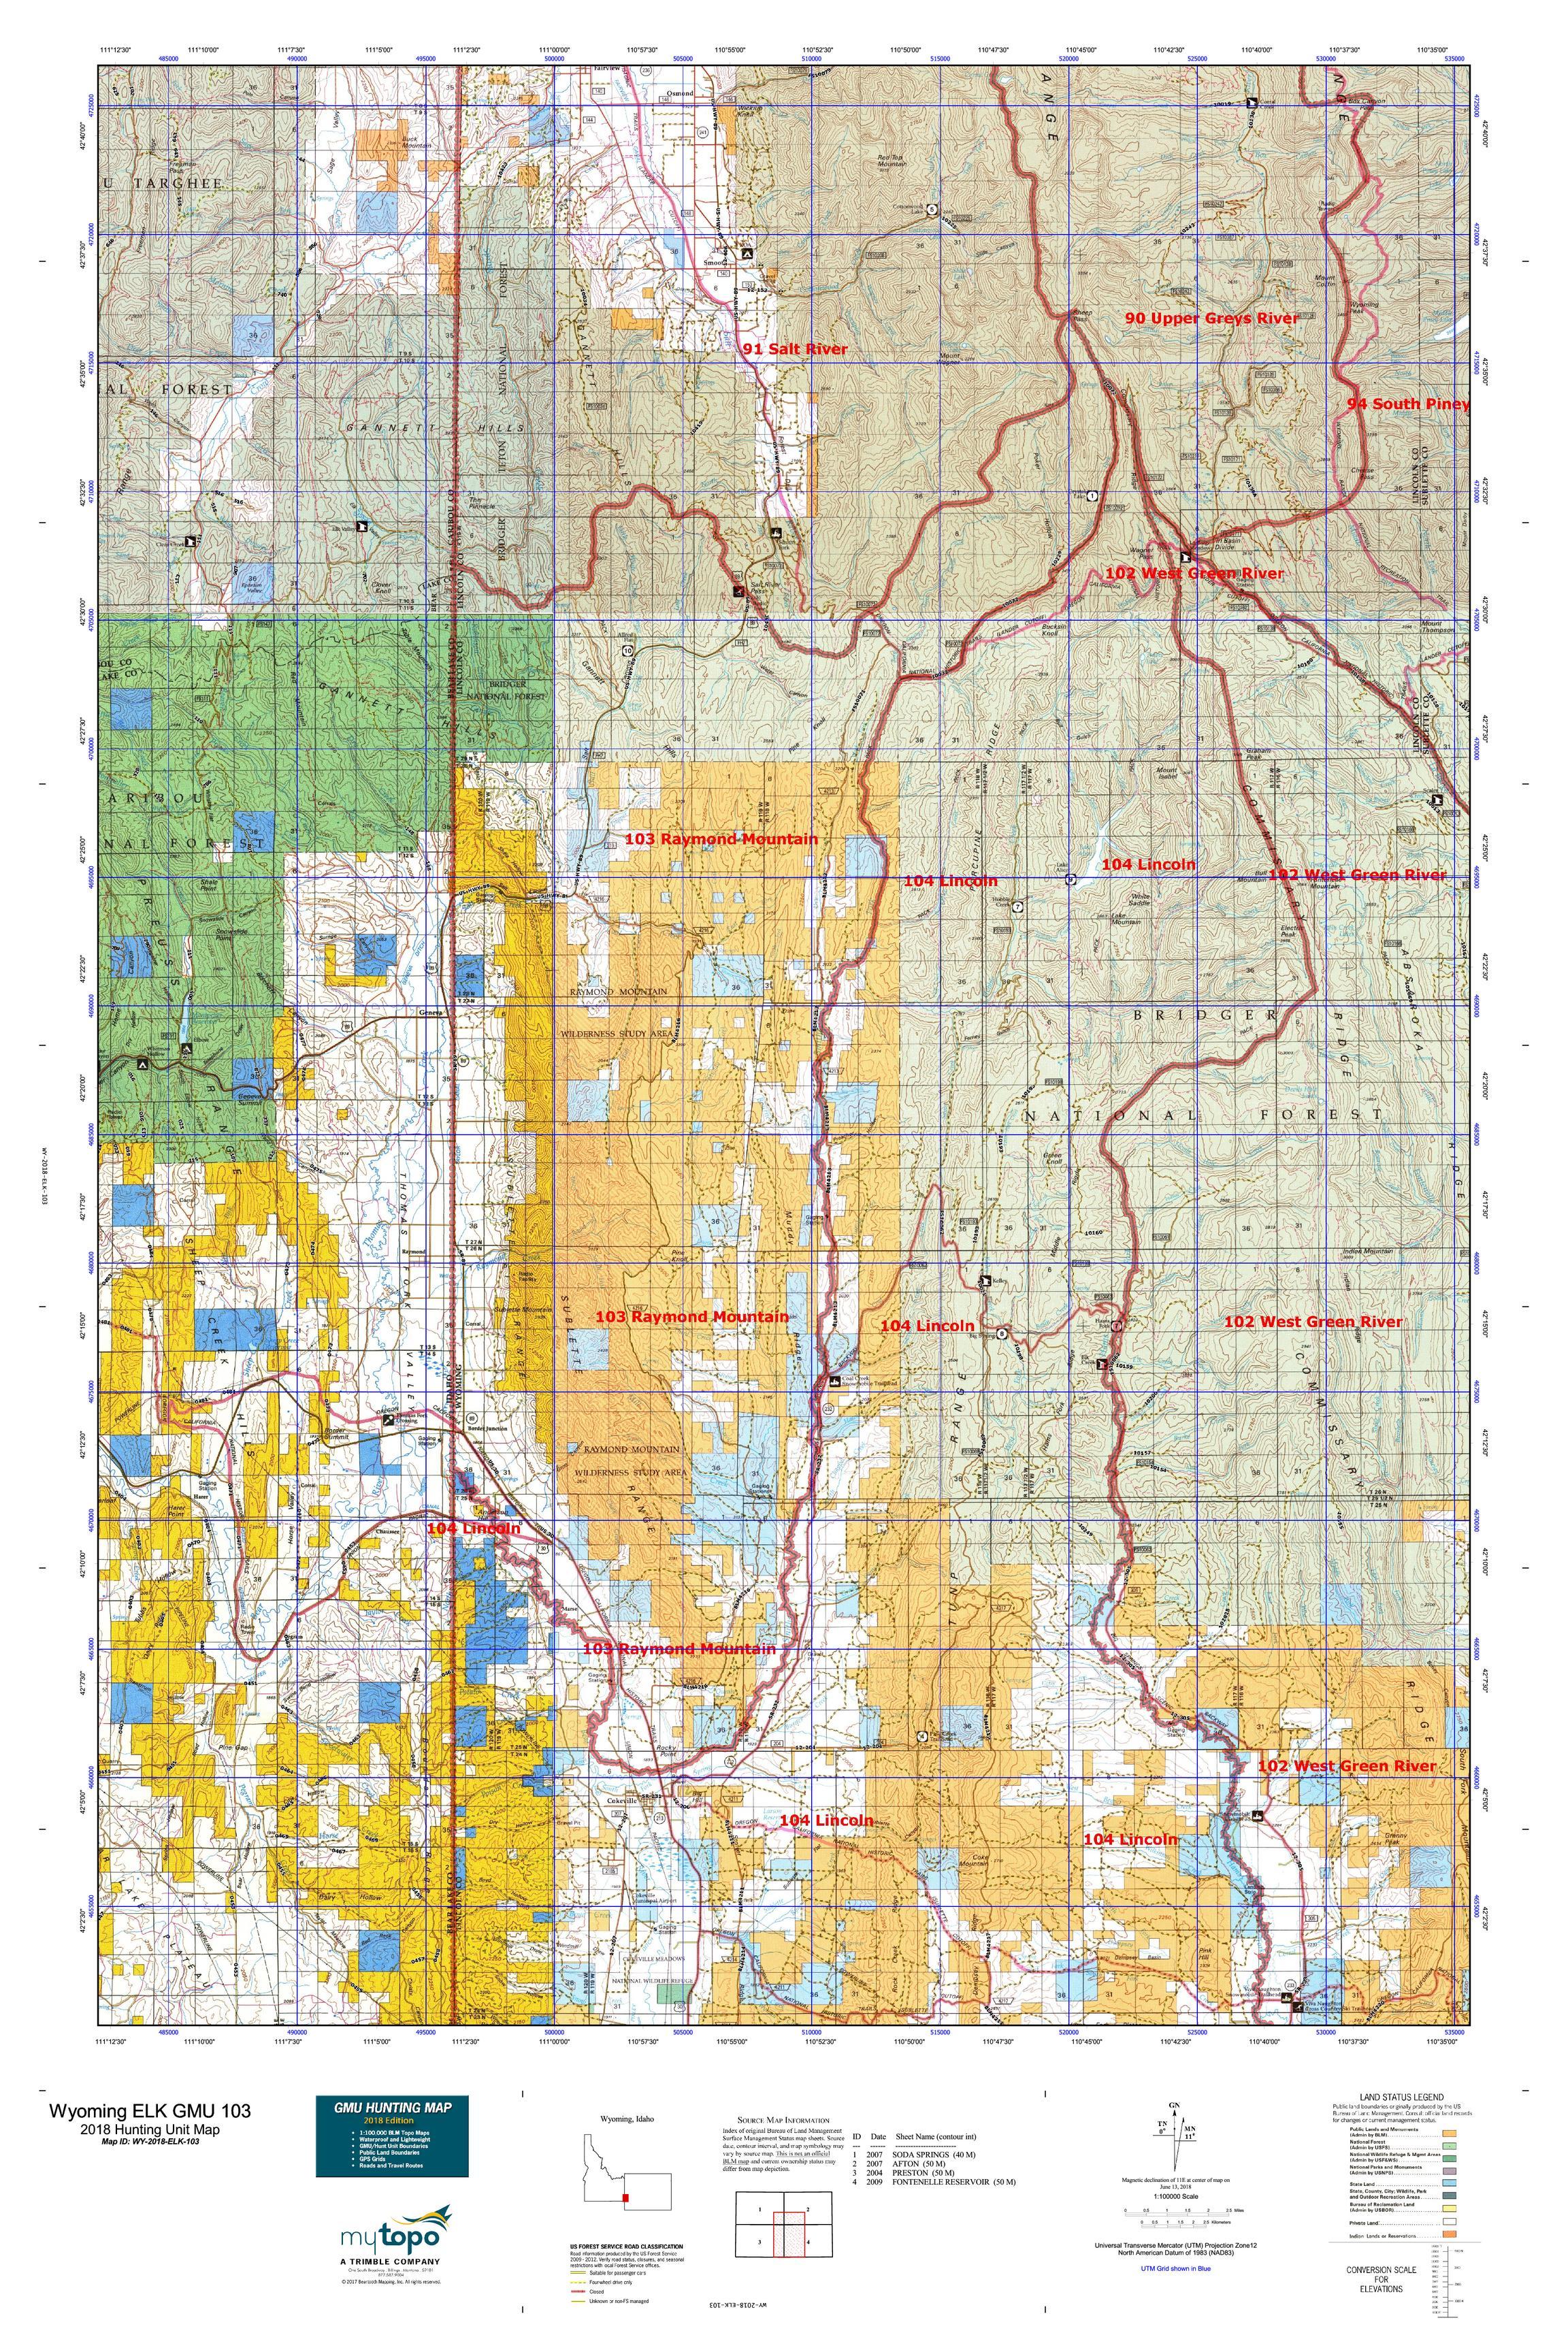 Wyoming Elk Gmu 103 Map Mytopo